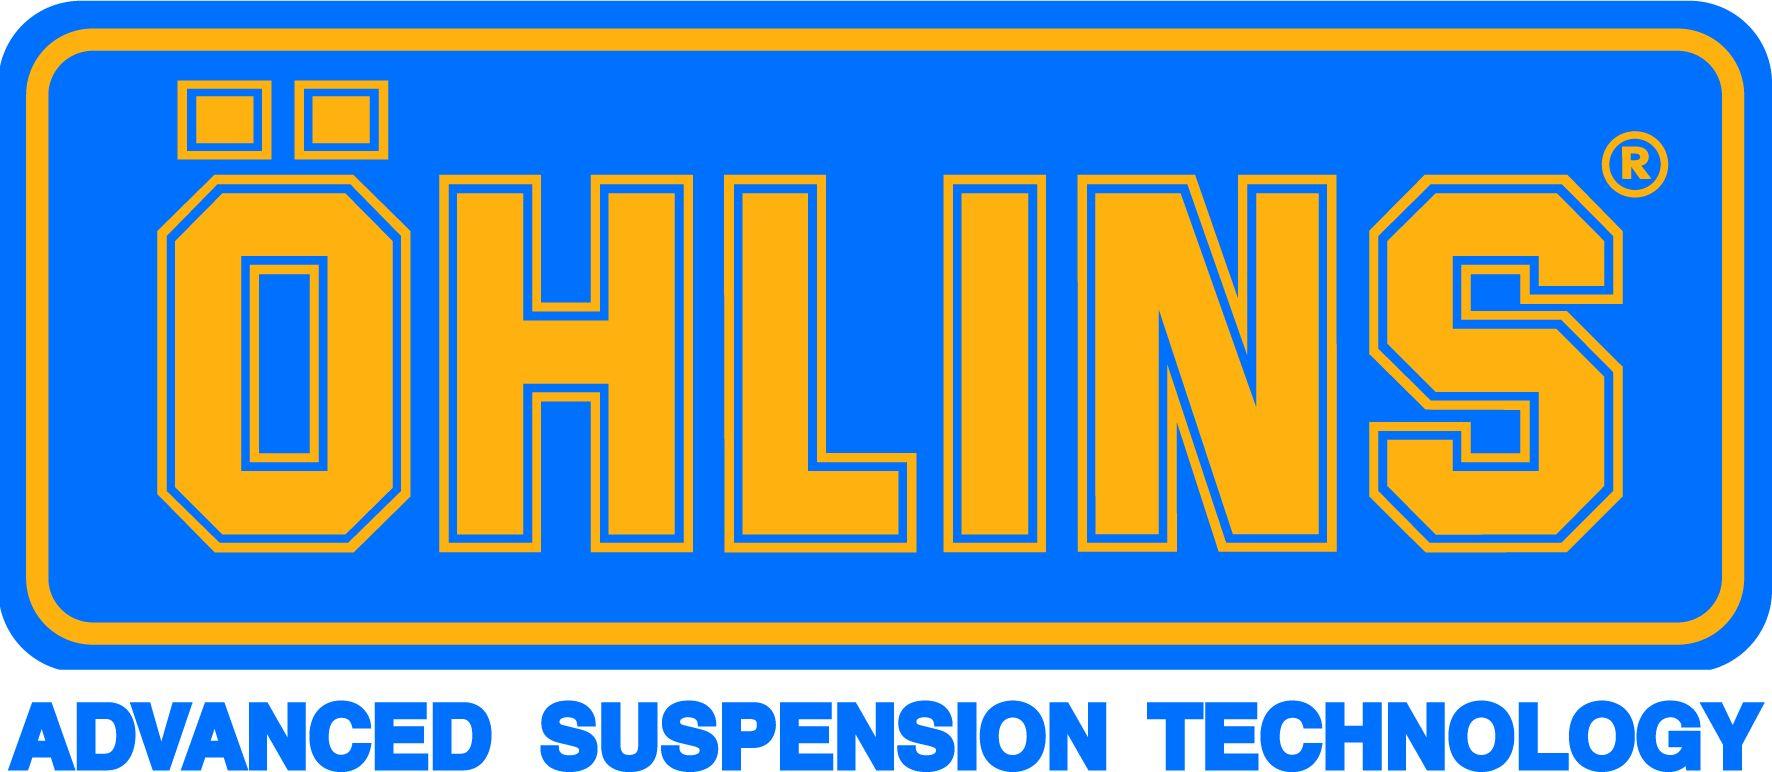 ohlins-logo.jpg